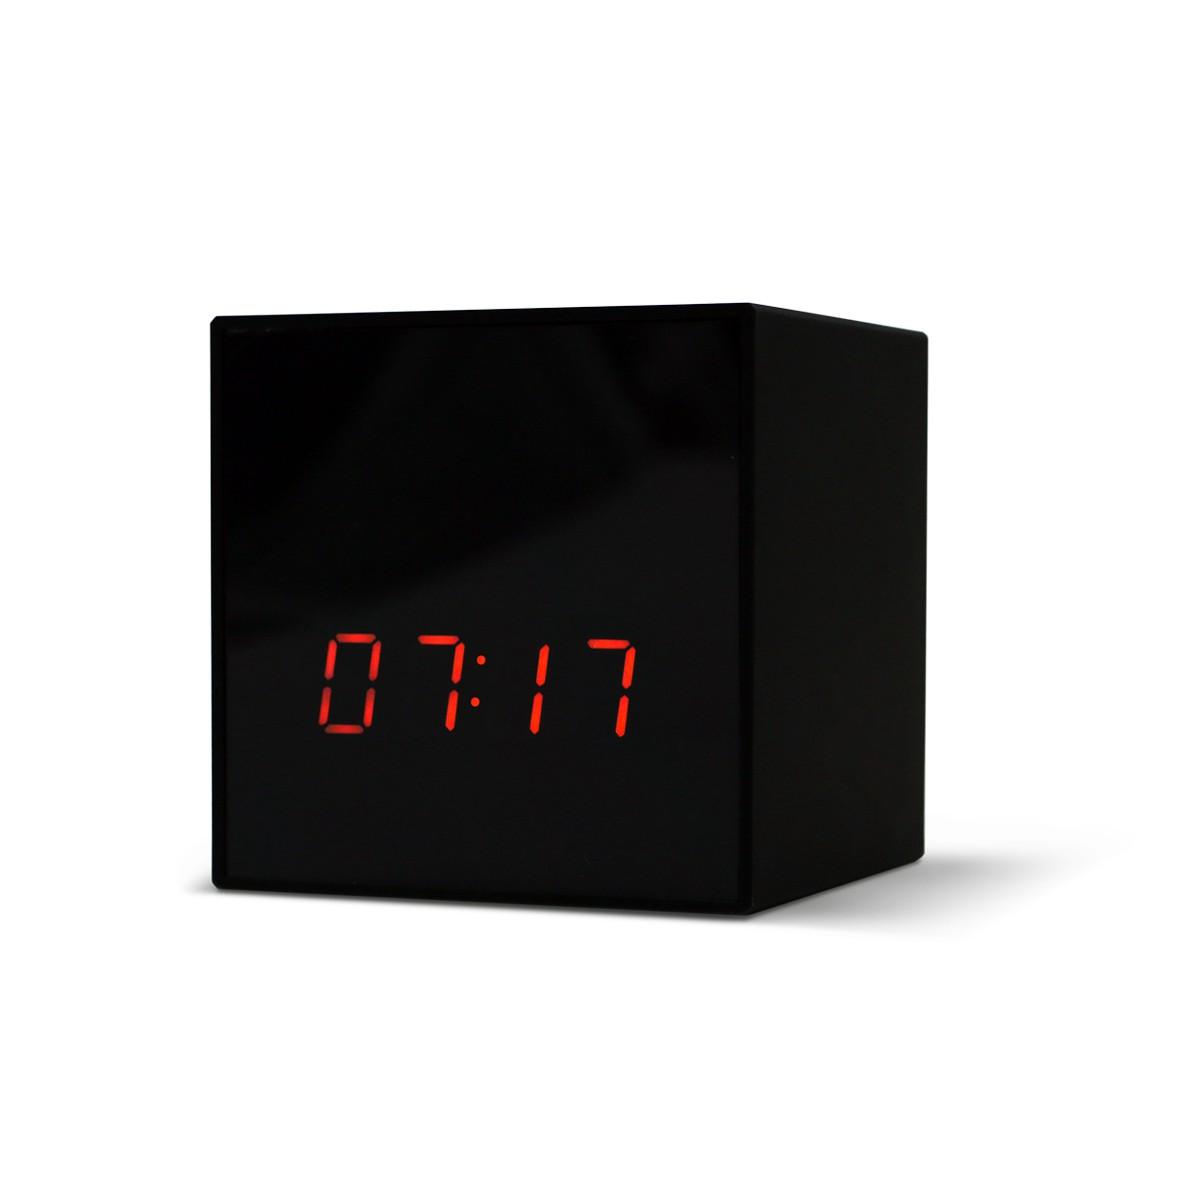 Hd 720p spy home clock security camera titathink hd 720p spy home clock security camera thecheapjerseys Images